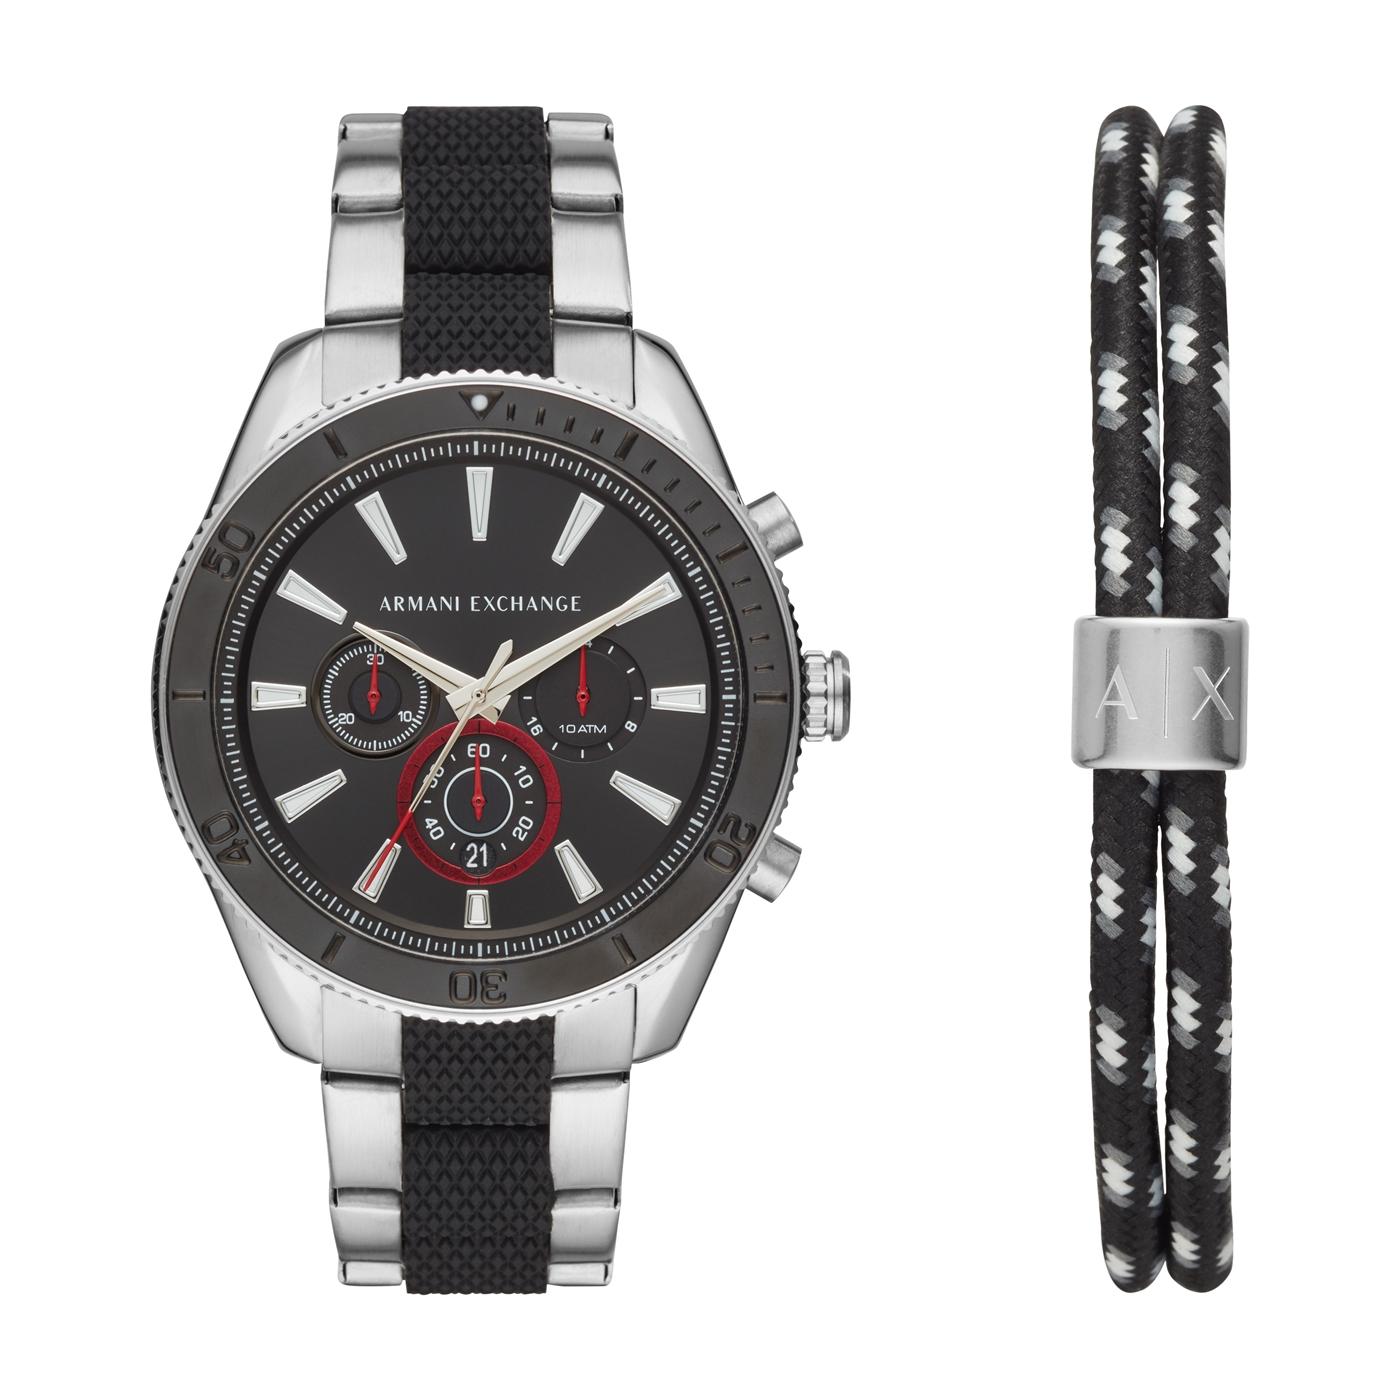 Afbeelding van Armani Exchange Enzo horloge AX7106